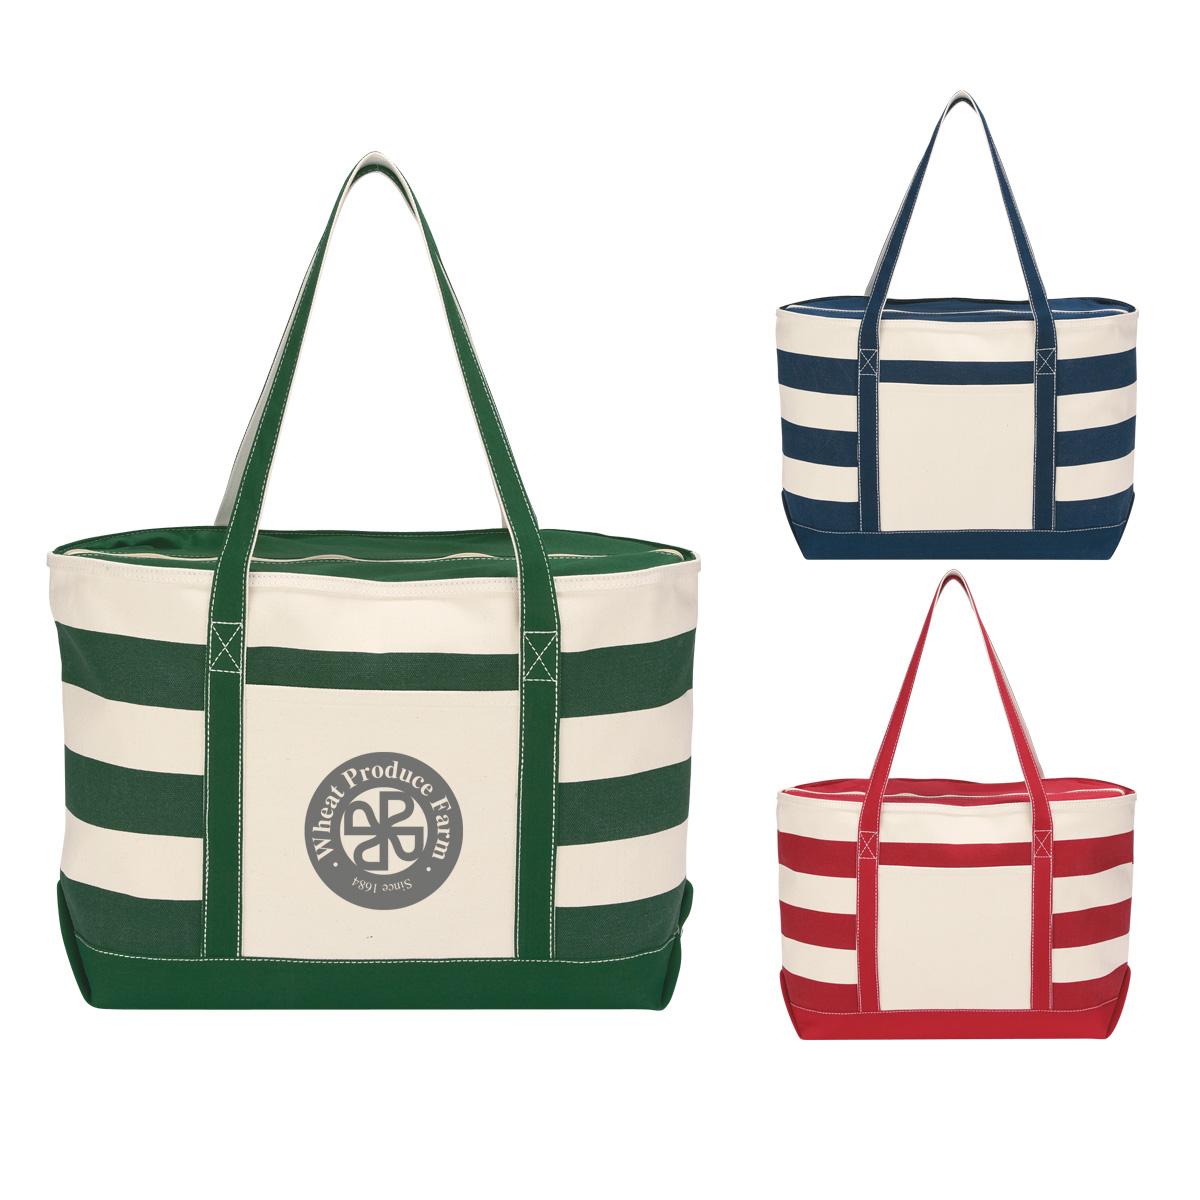 2203a8eac #CM 3240 Cotton Canvas Nautical Tote Bag | Custom Thumb Drive | CMI  PromotionsCMI Promotions